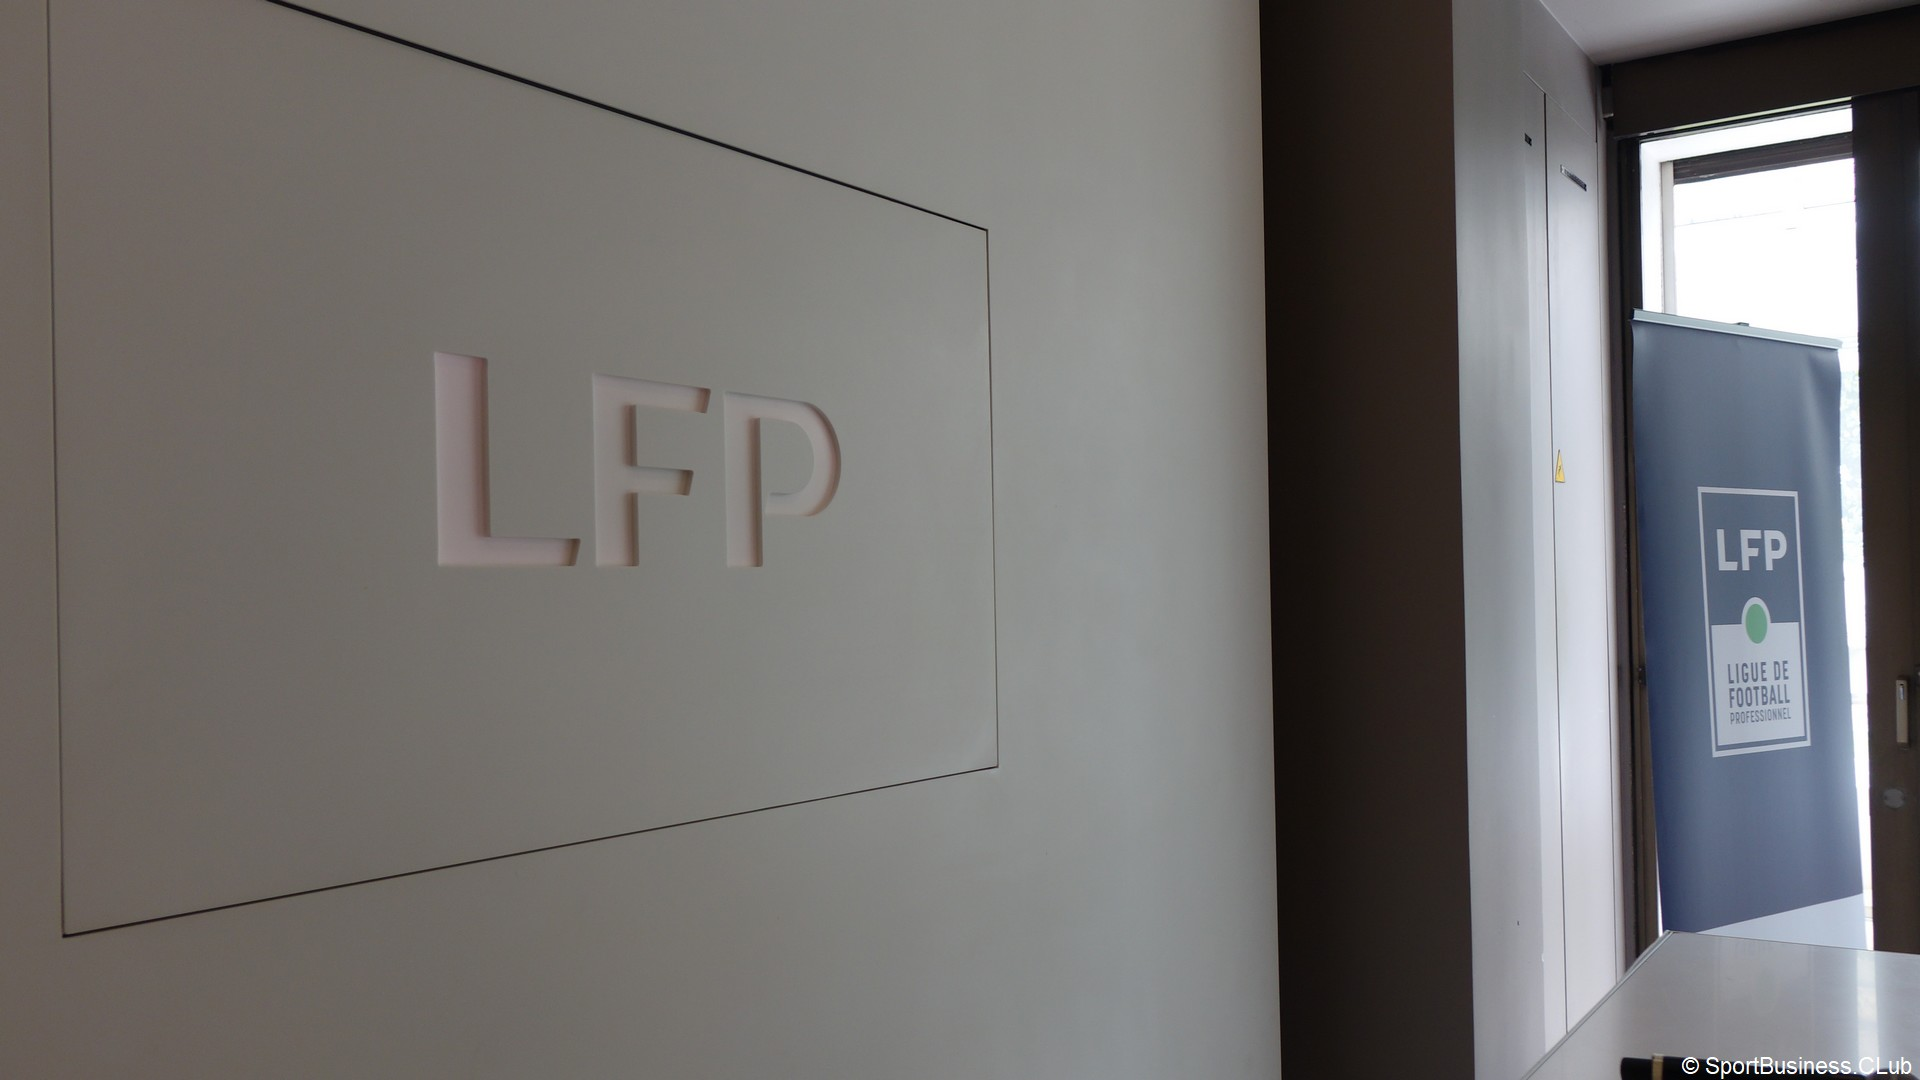 LFP – Ligue de football professionnel (1) Logo